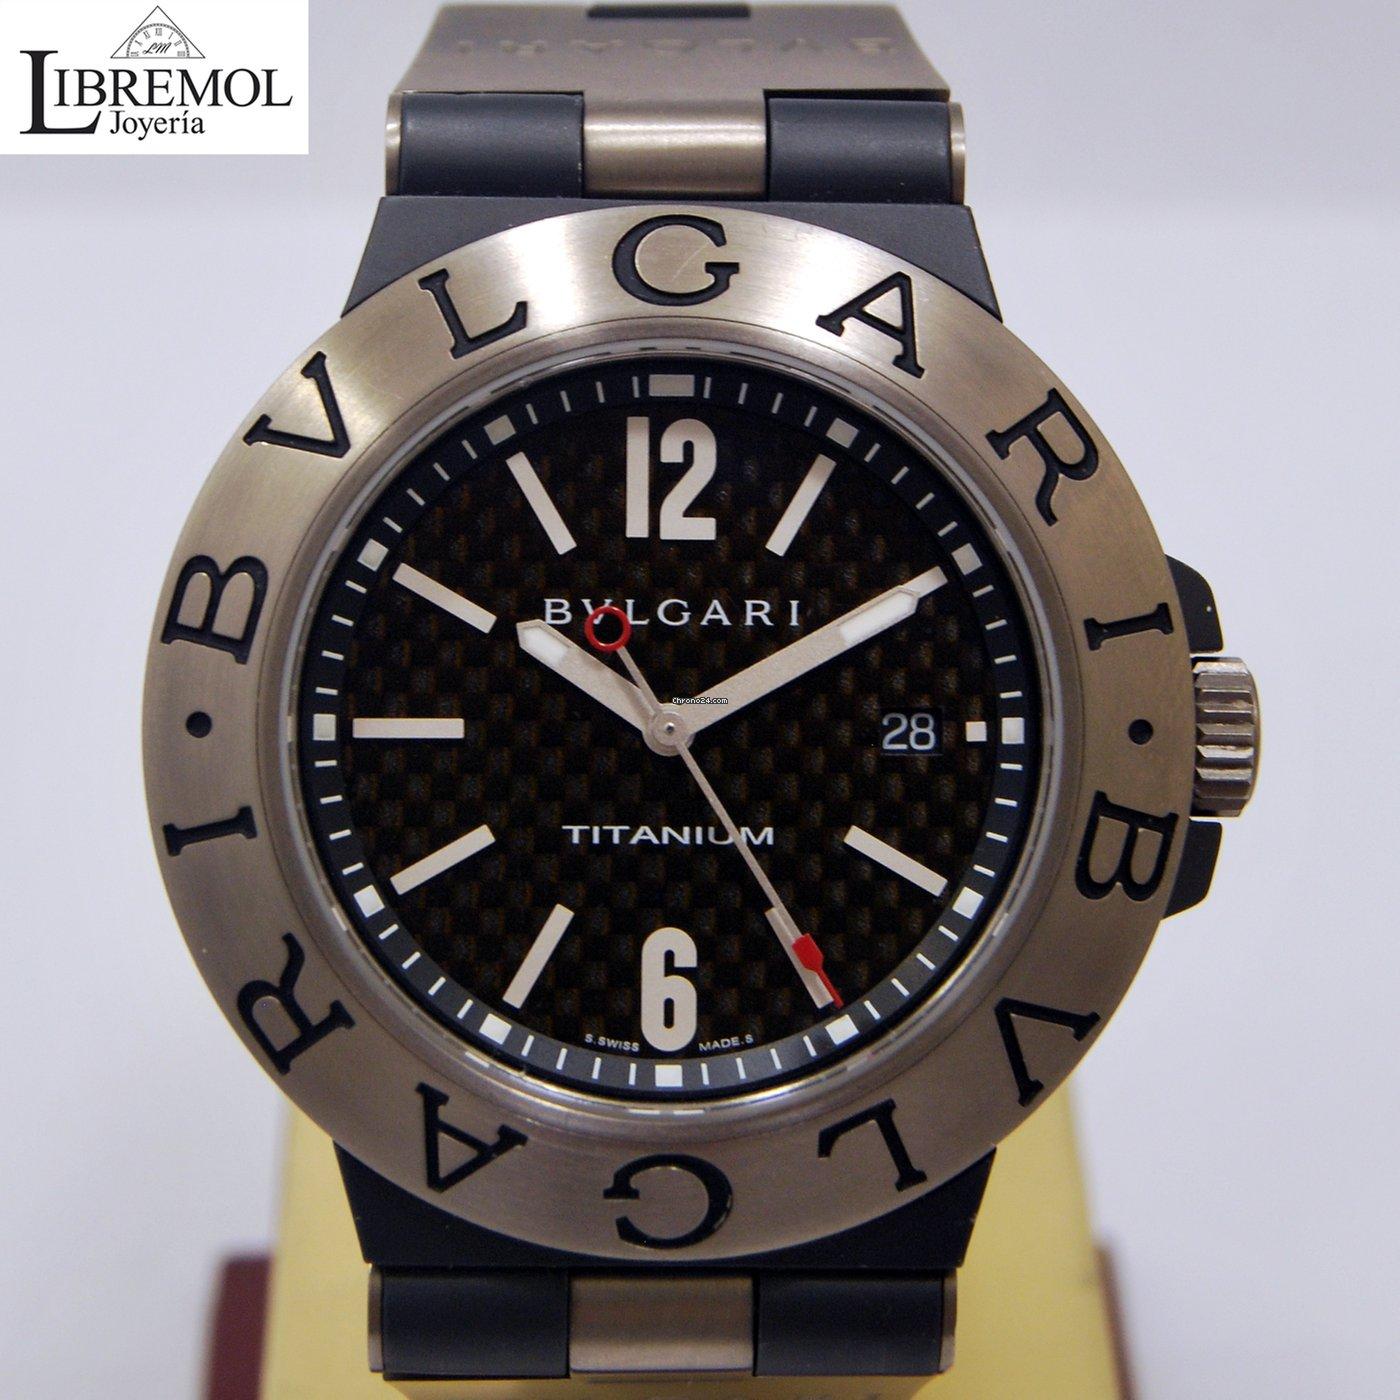 87640ee9be45 Bulgari Diagono Titanium 44 mm en venta por 2.000 € por parte de un Trusted  Seller de Chrono24